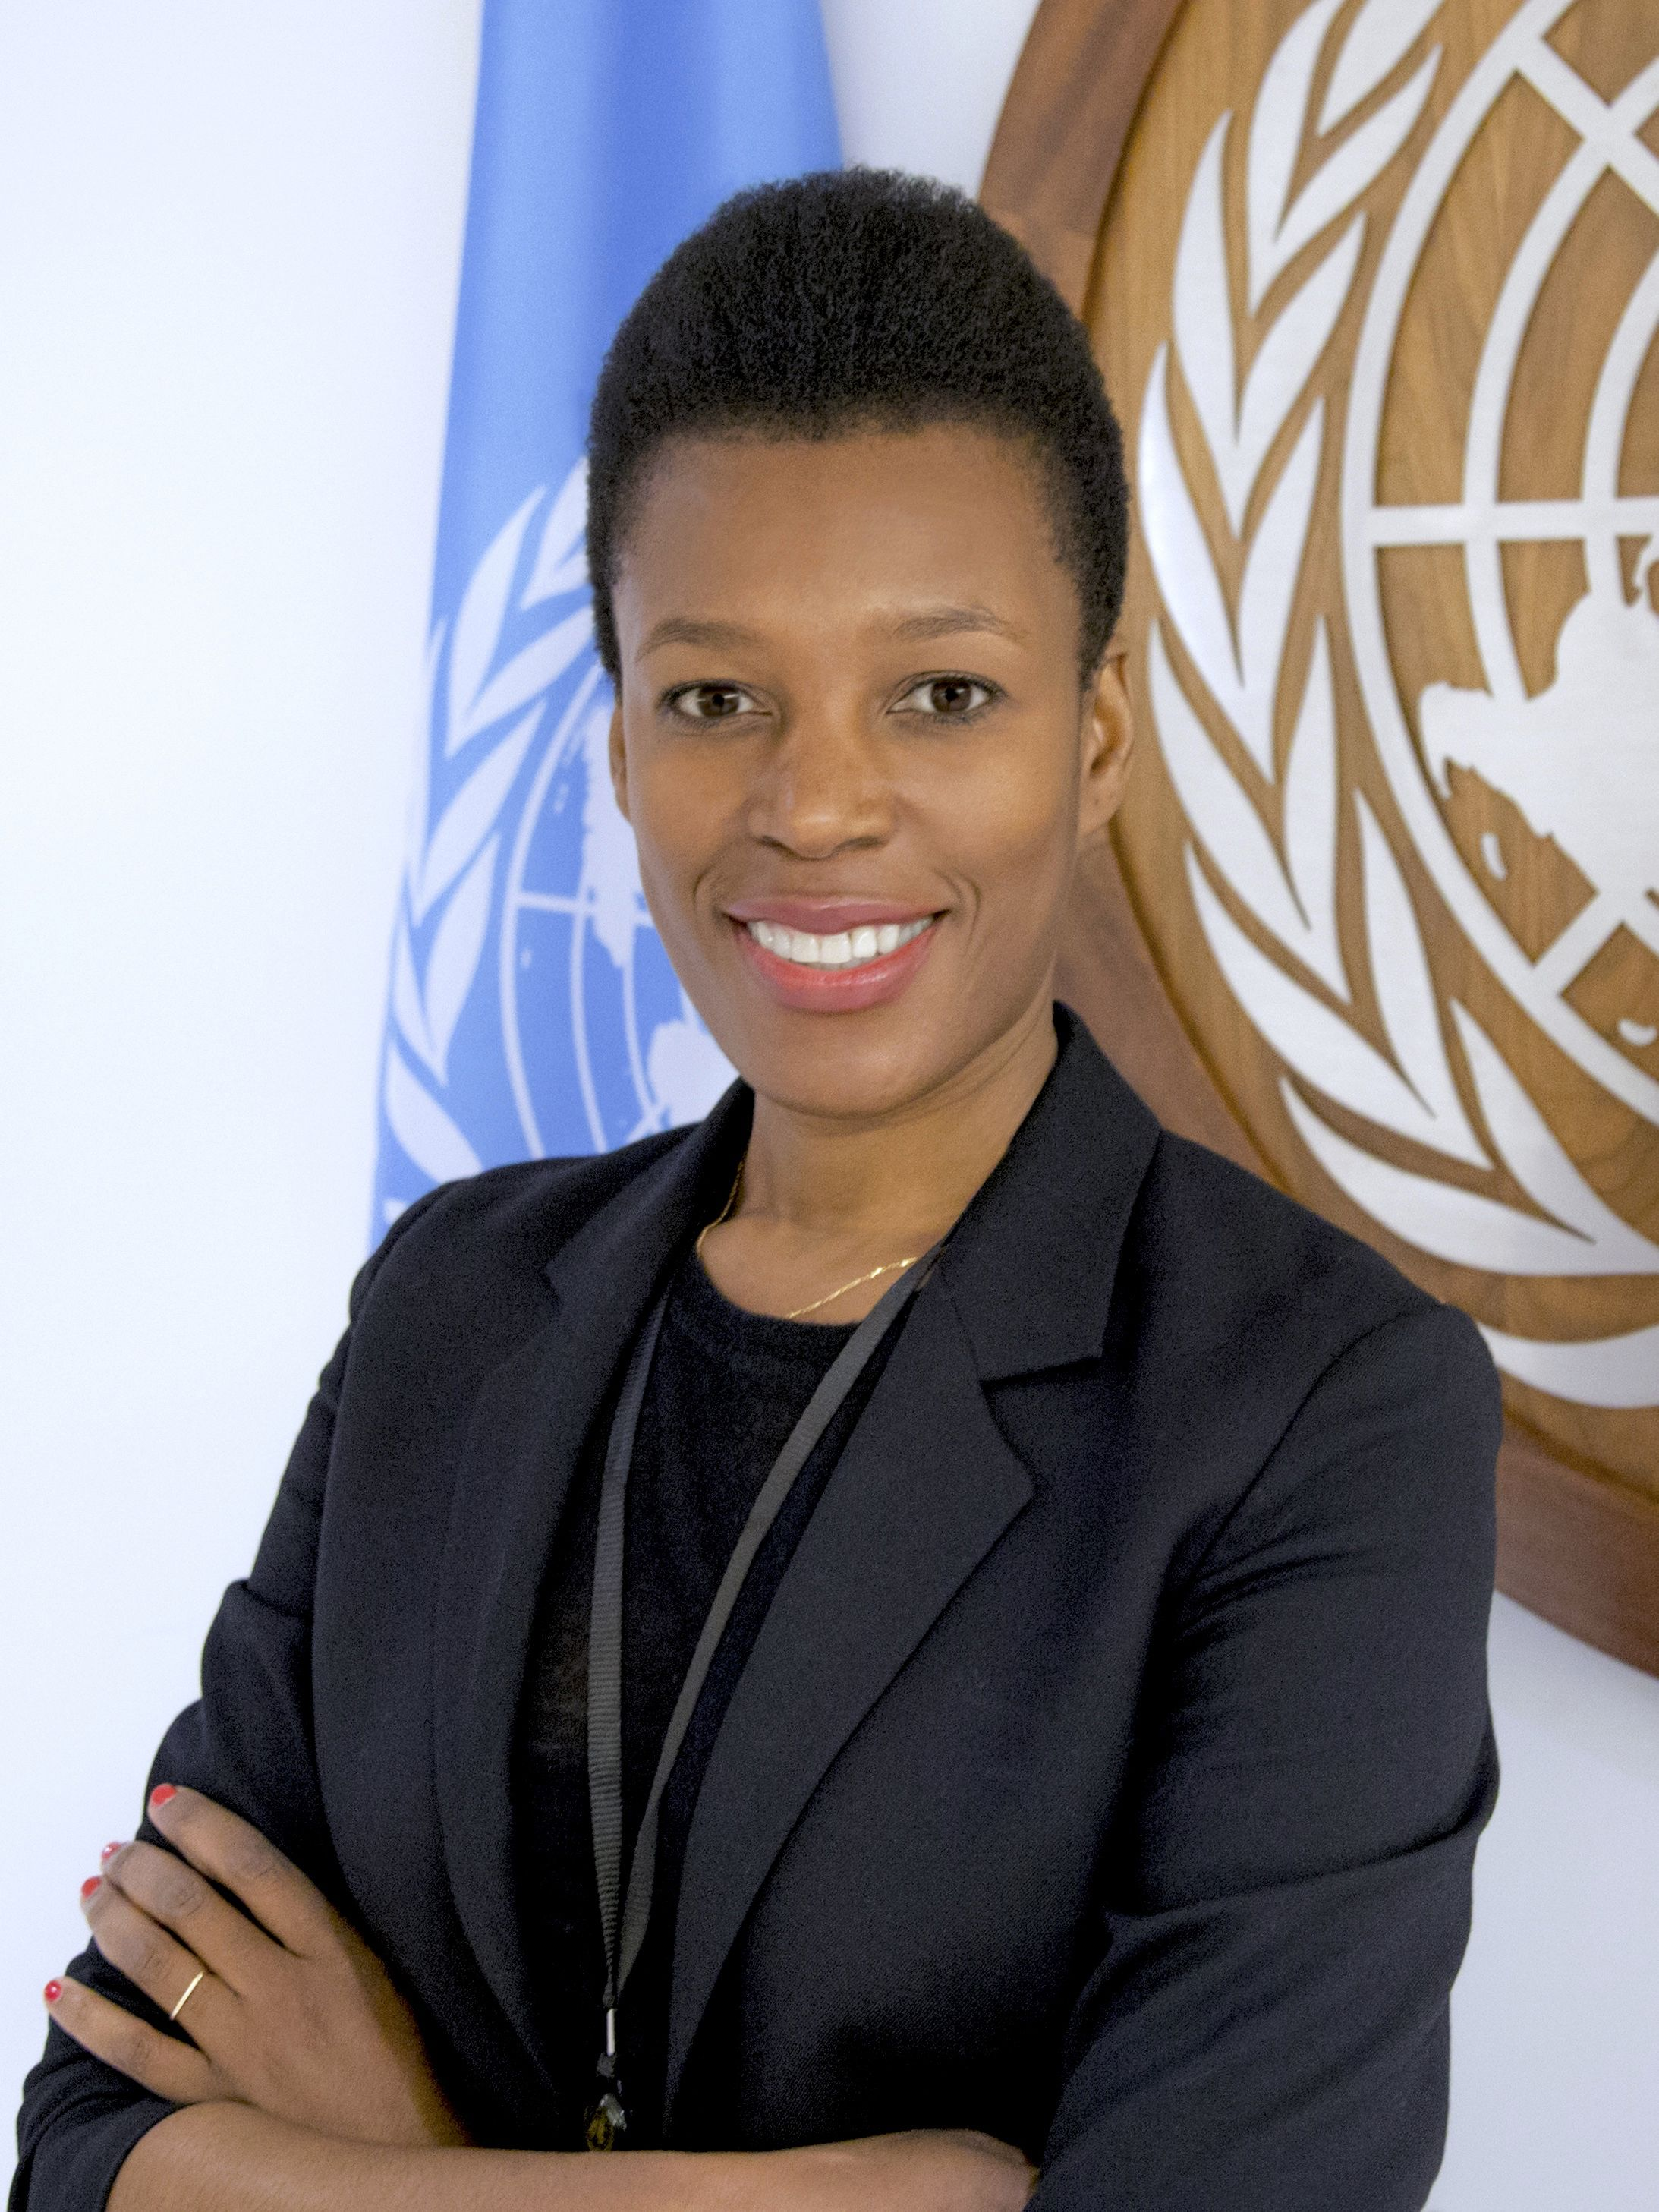 Elizabeth Nyamayaro joins the UN World Food Programme as Special Advisor